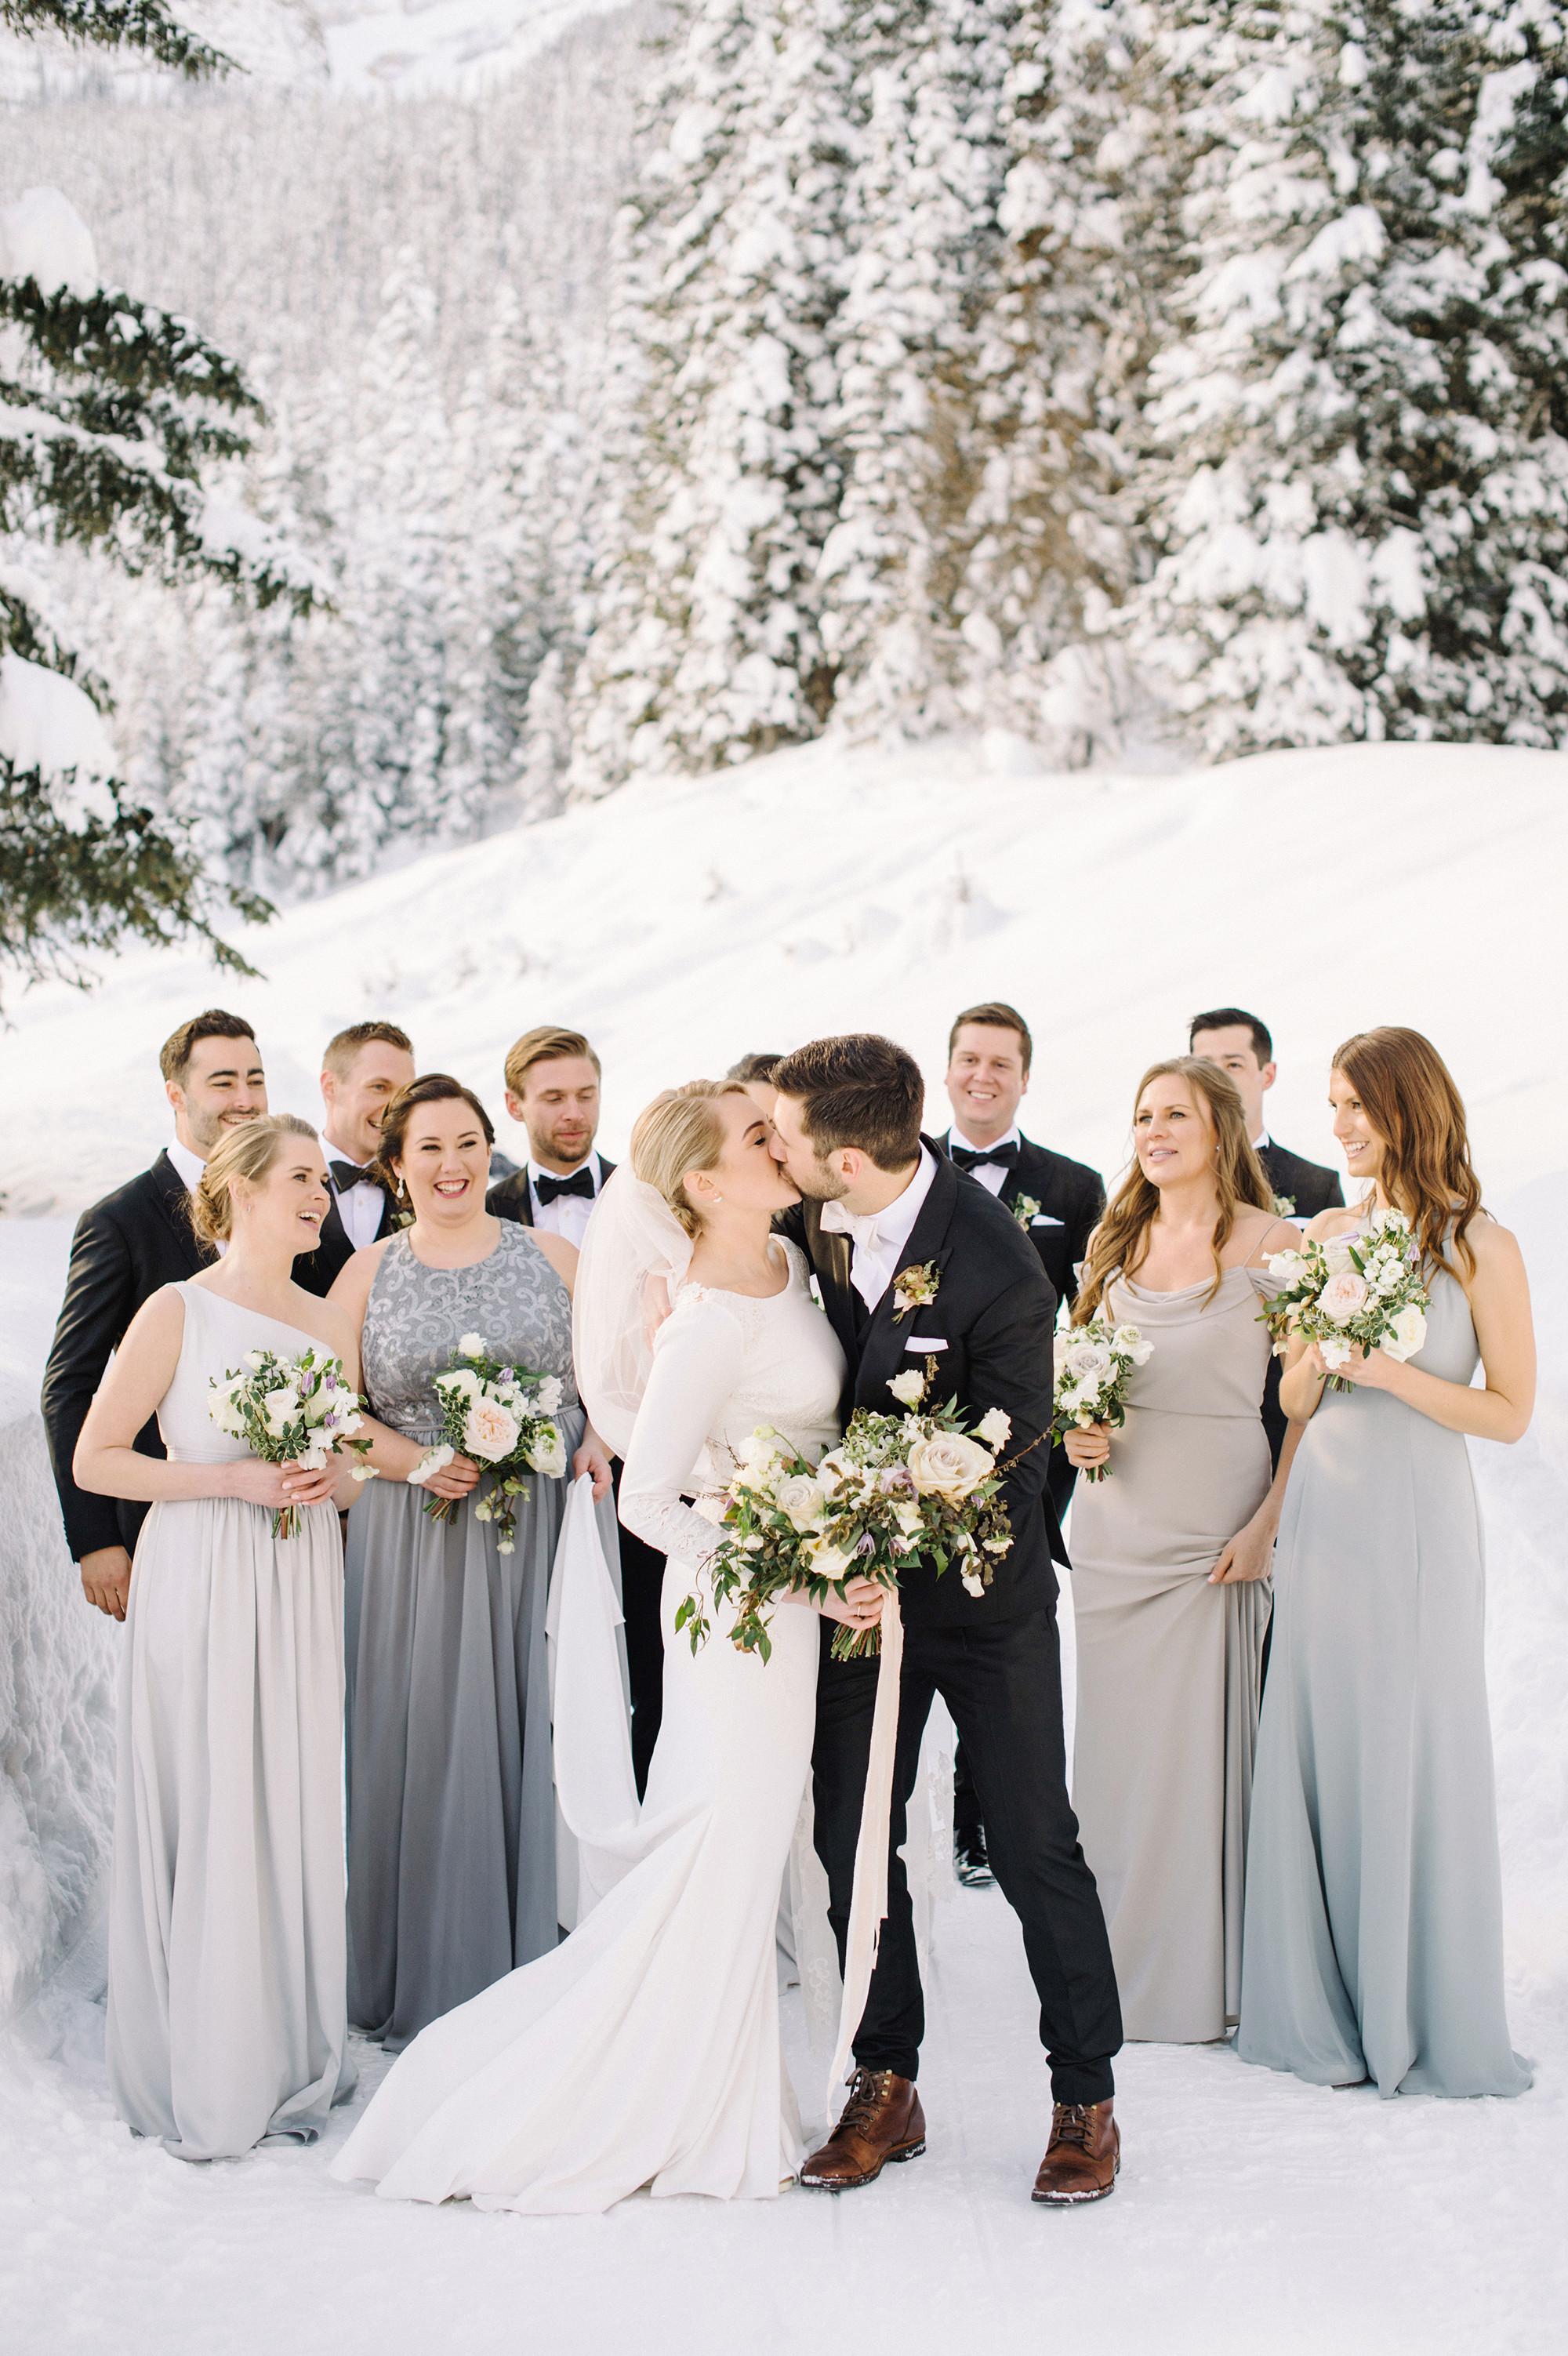 Martha Stewart Weddings Shares 10 of Their Favorite